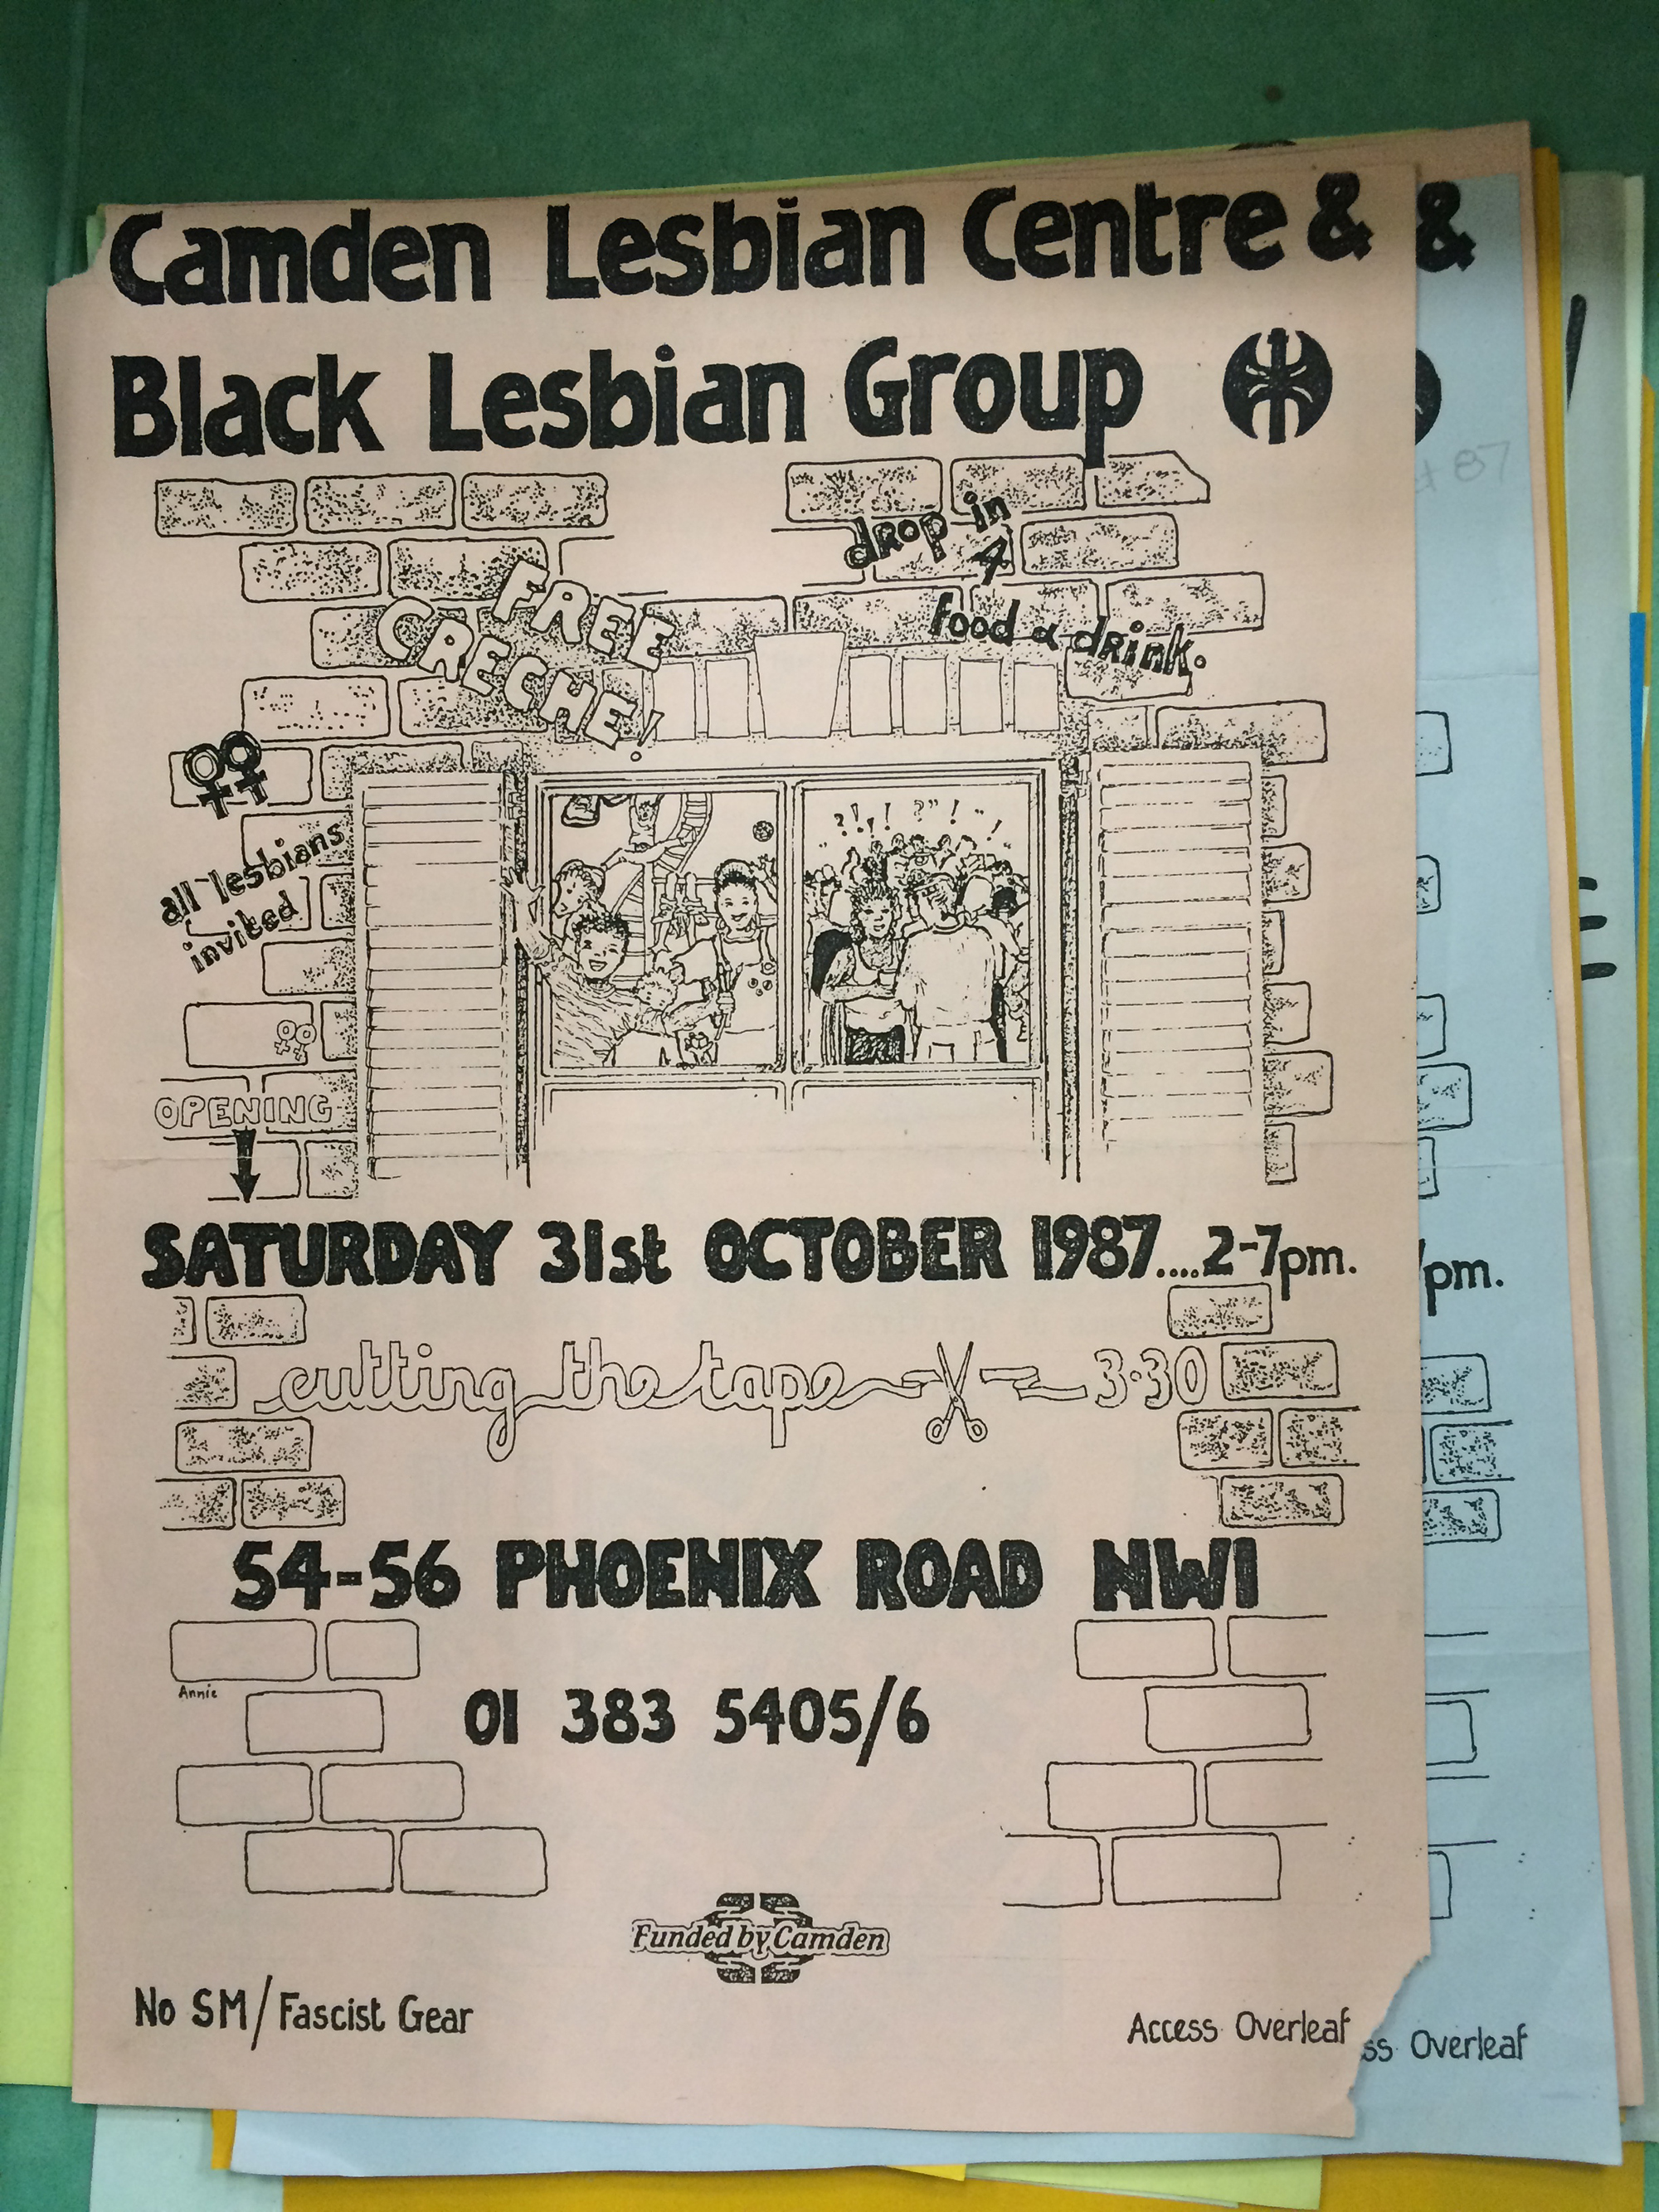 group of black lesbians